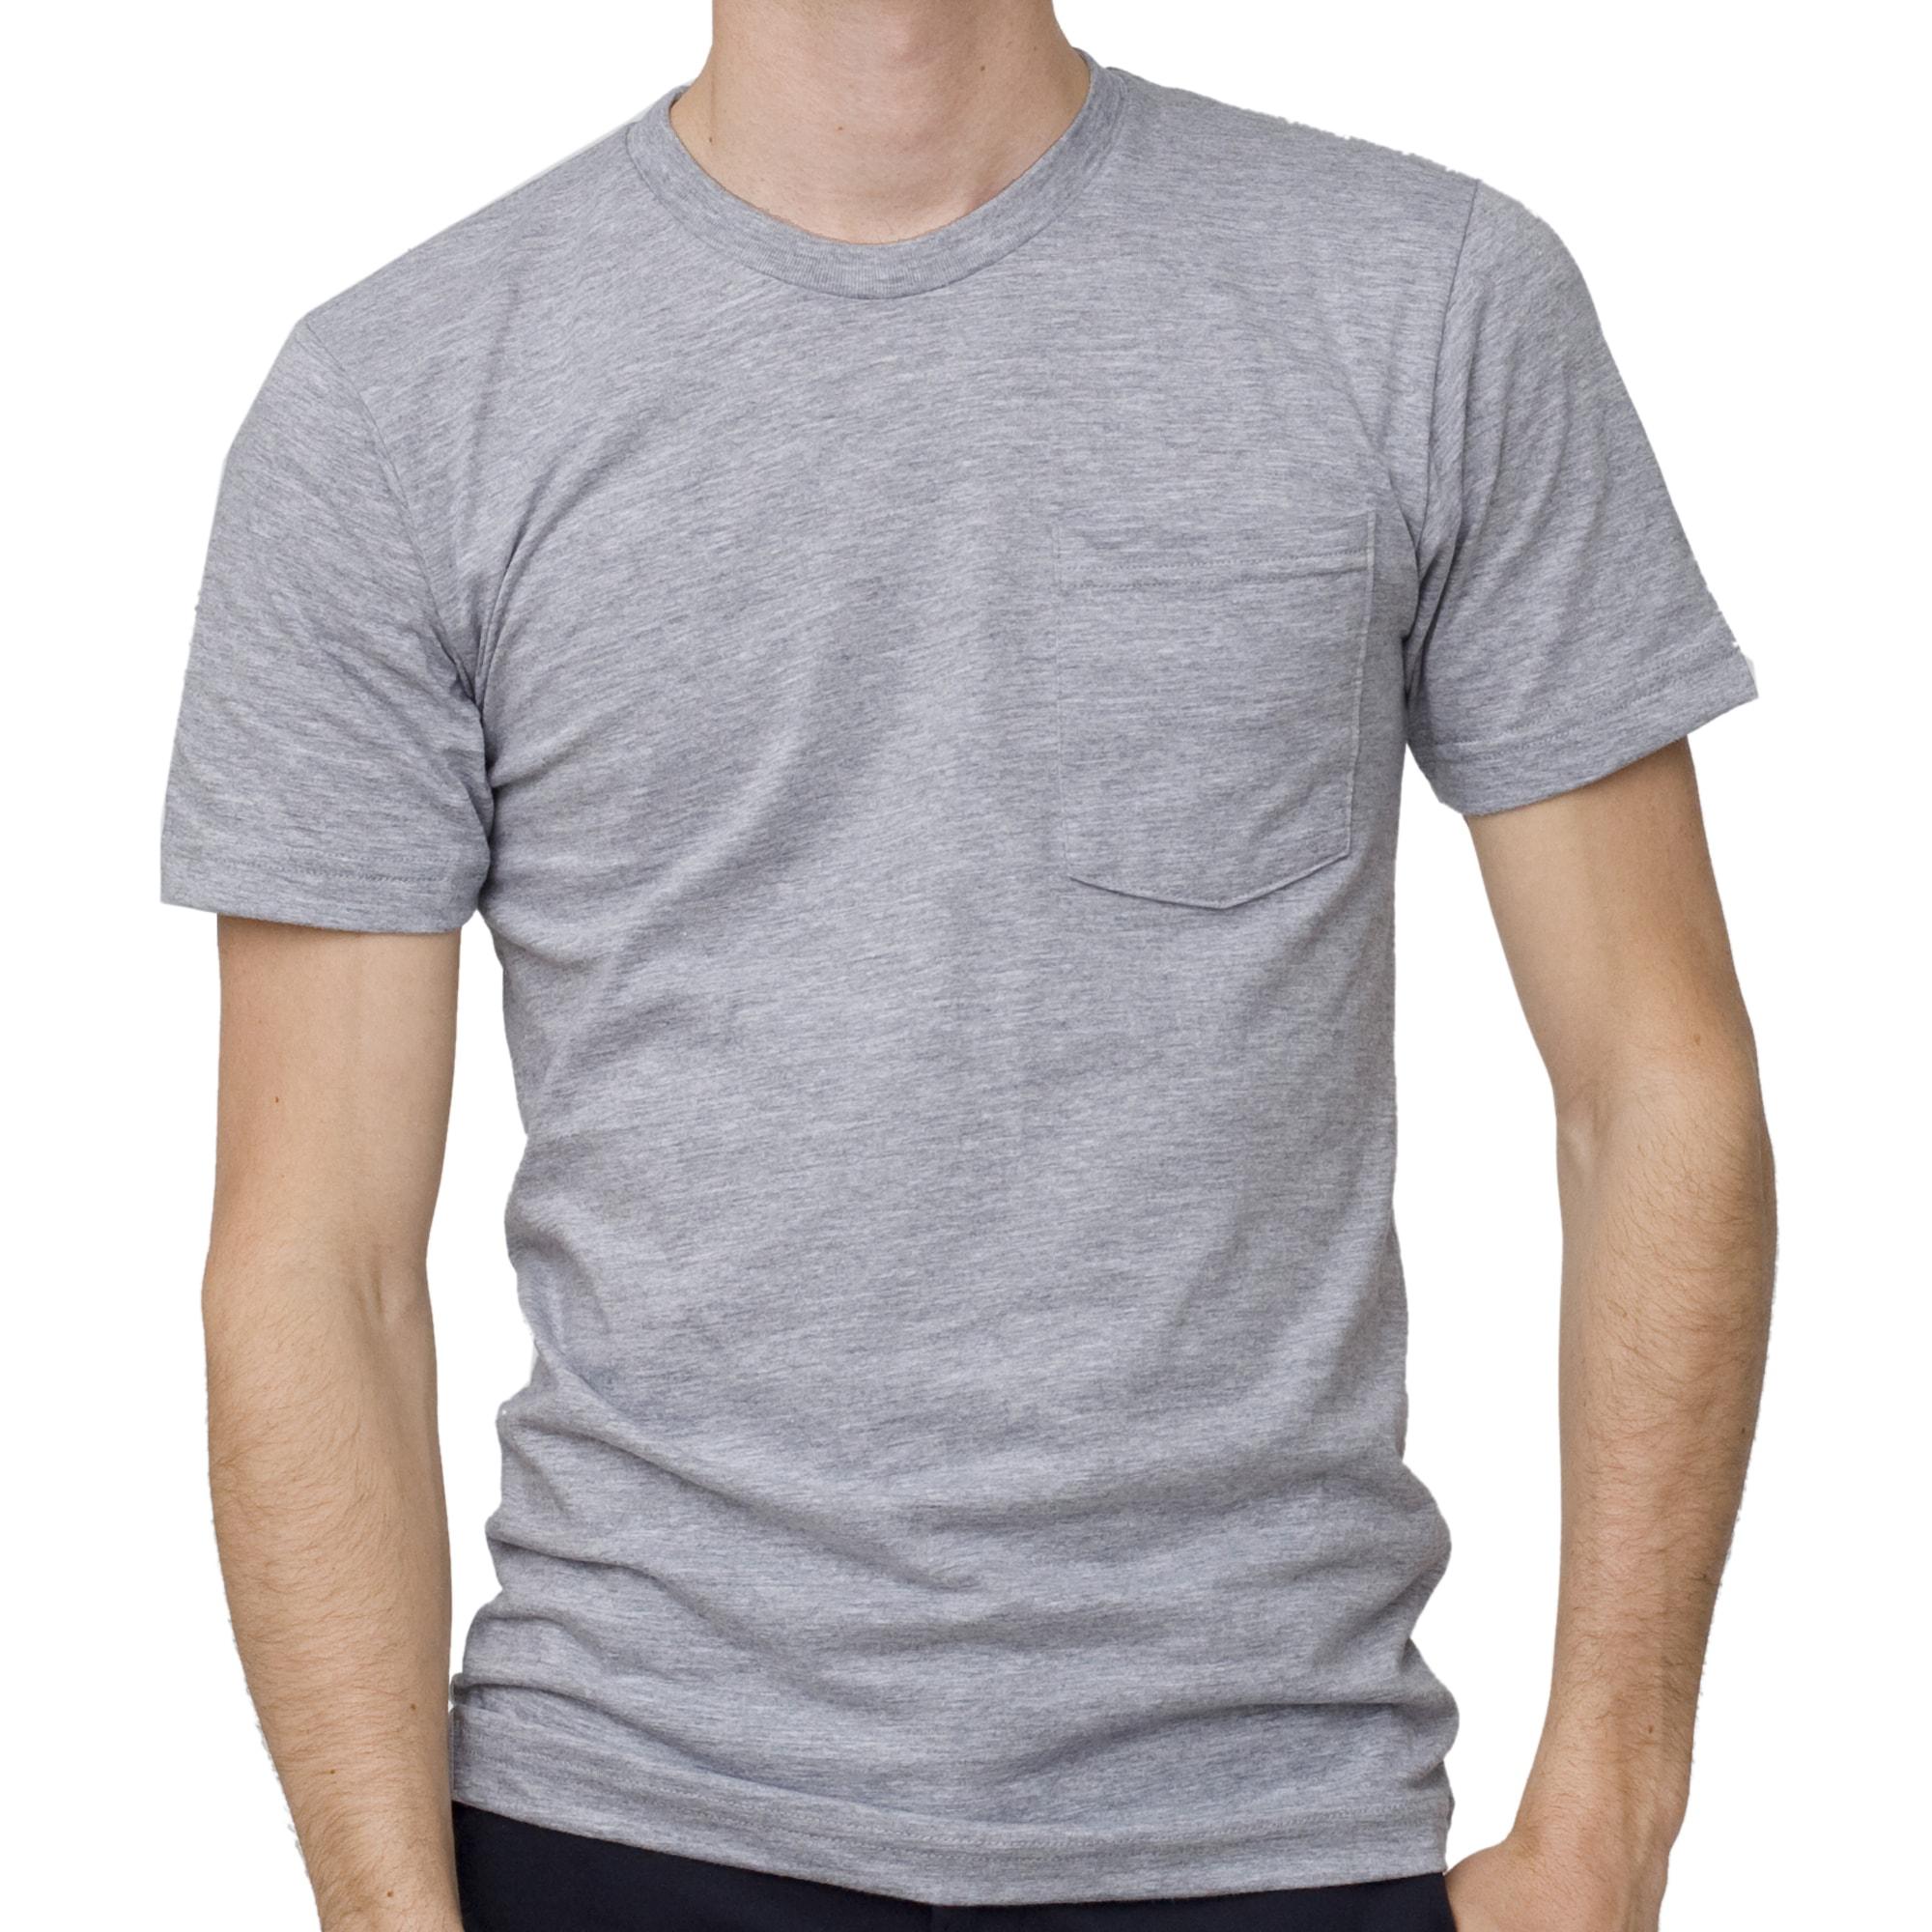 American apparel men 39 s grey pocket t shirt 3xl free for Mens 3xl t shirts